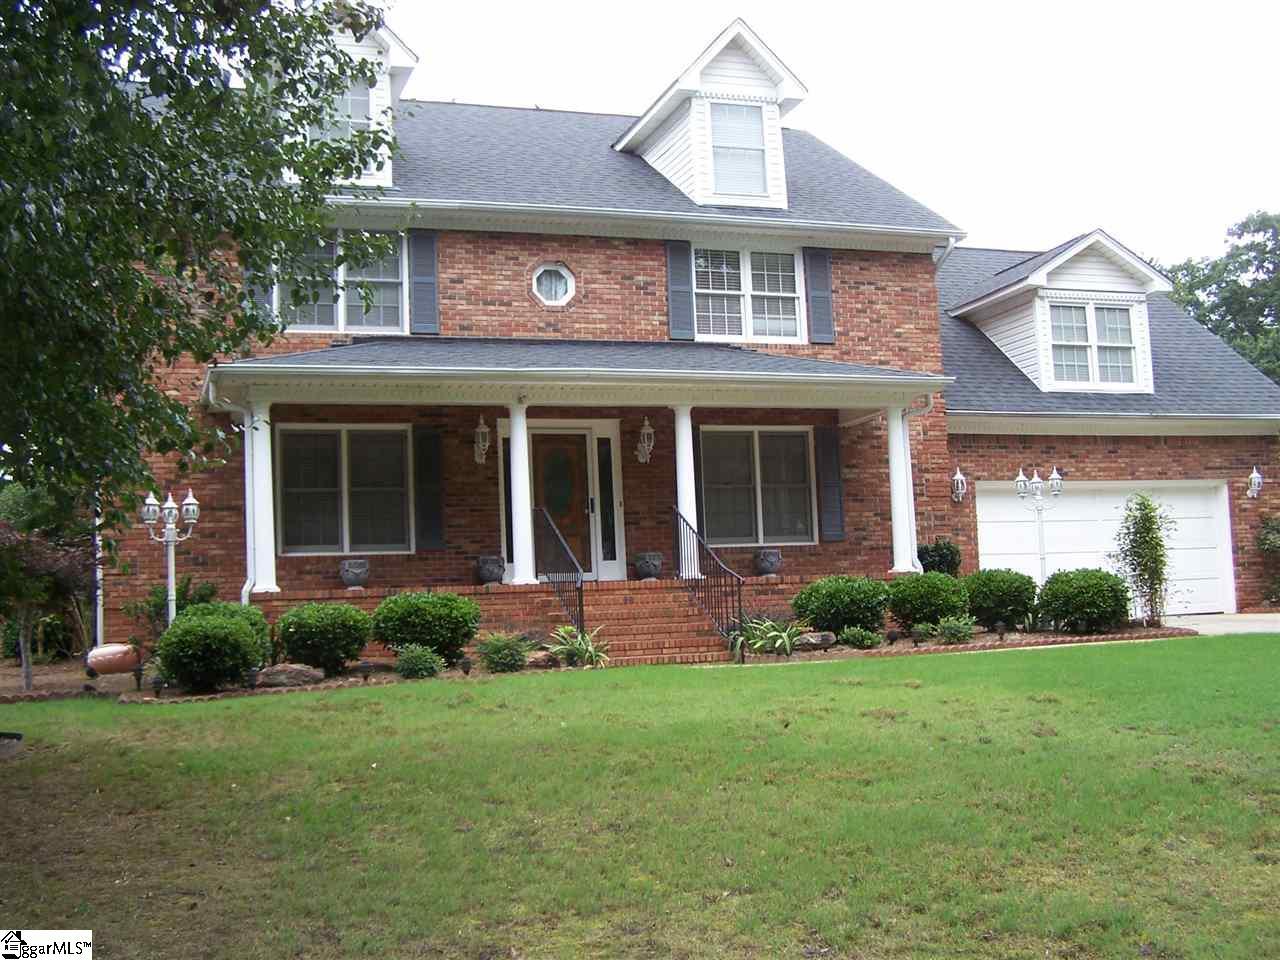 Greenville houses for sale under 300k